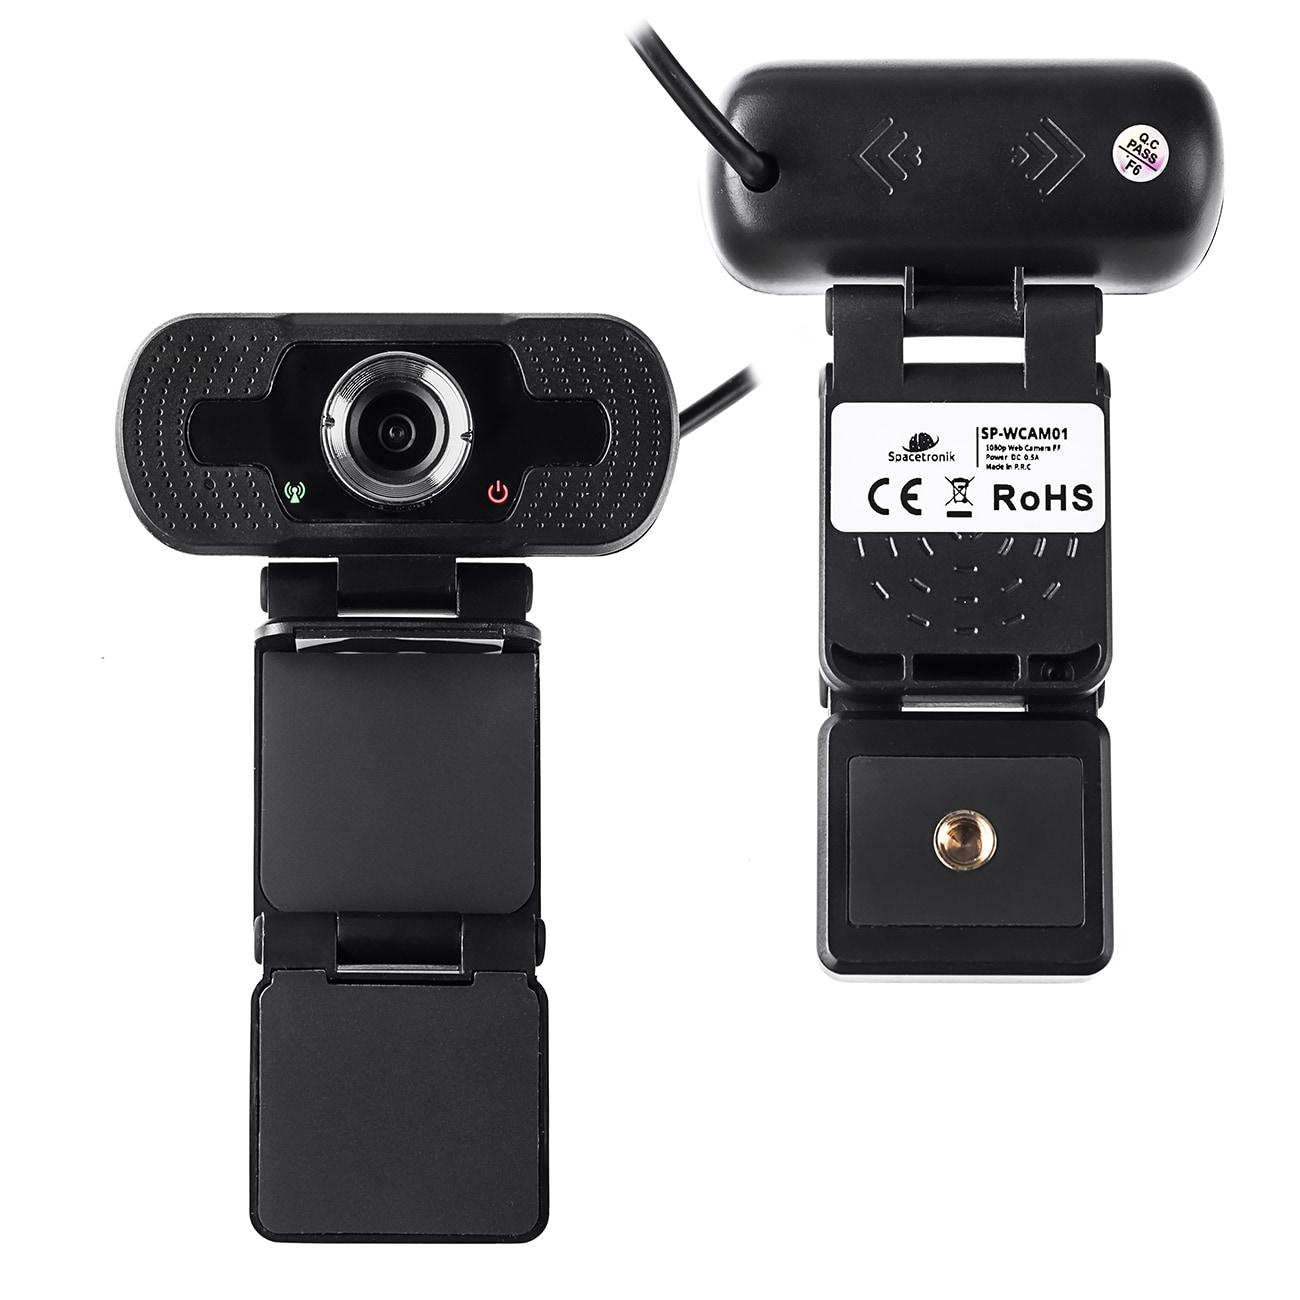 Webcam for Streaming Microphone Camera USB FHD SP-WCAM01 - 2